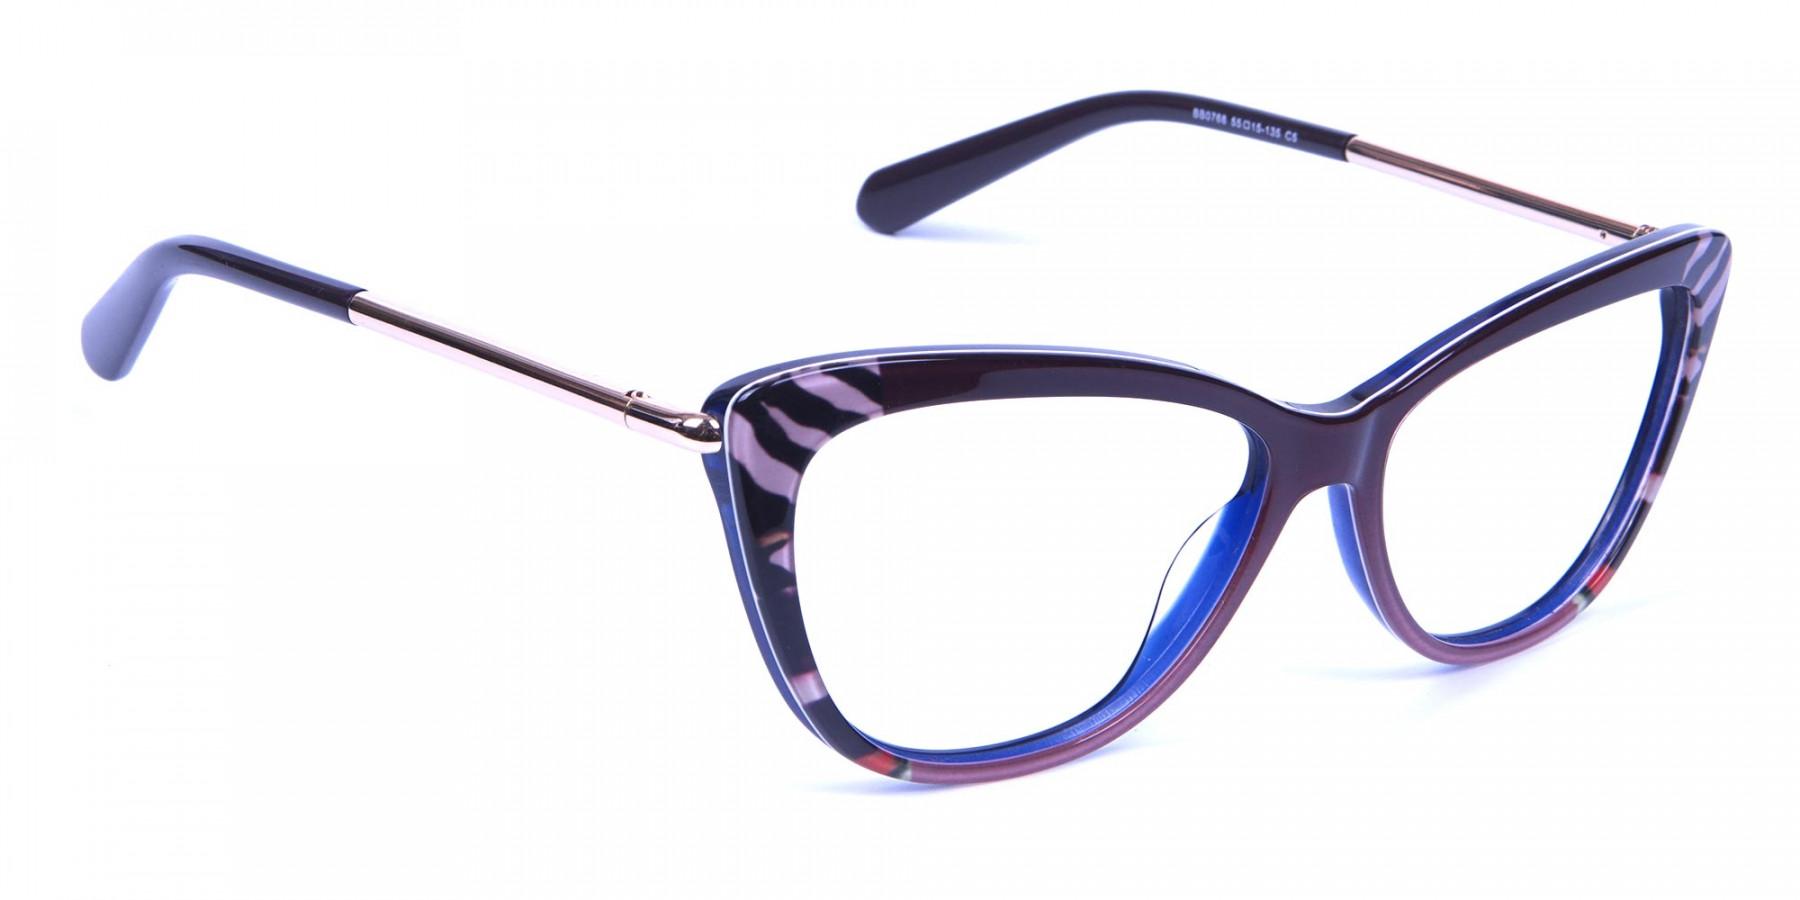 Gold Brown Zebra Glasses